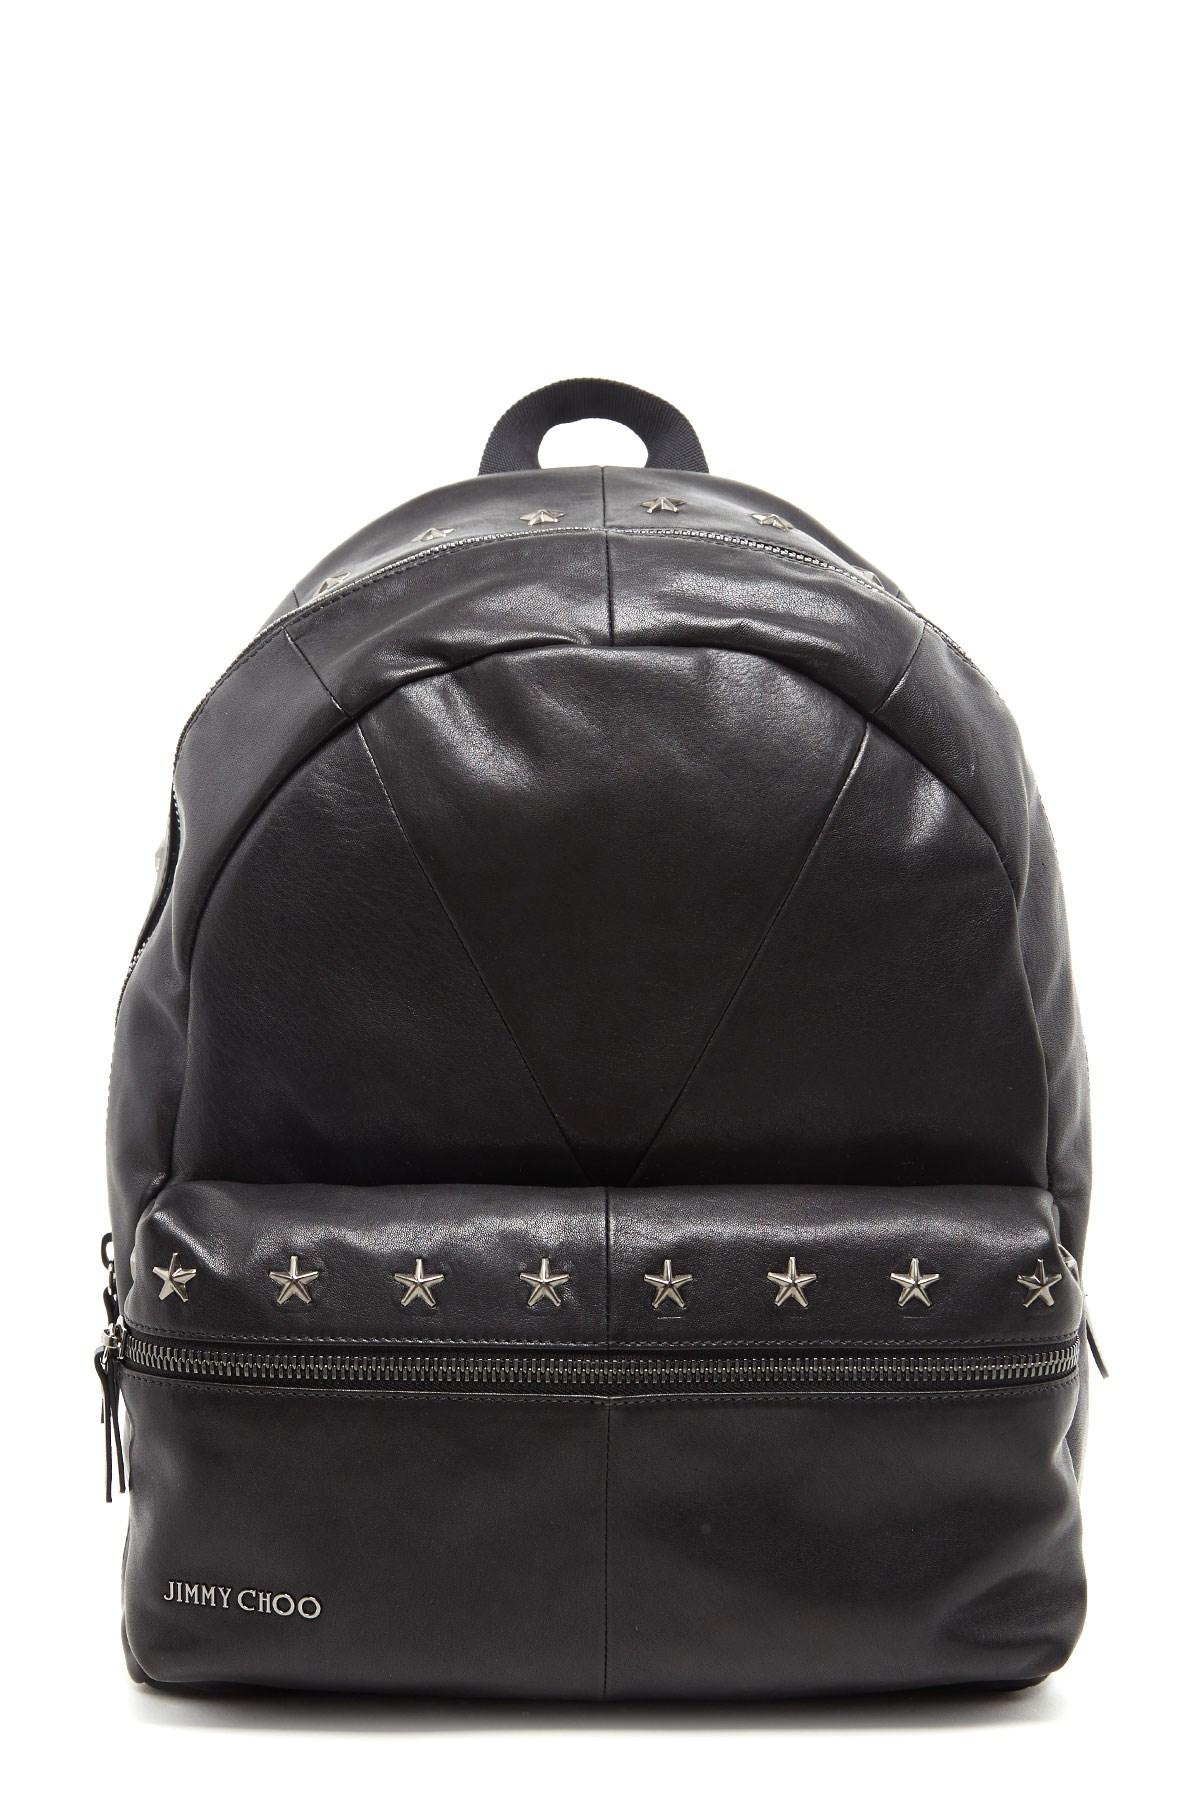 e4375bde3c61 jimmy choo  Reed  Backpack available on julian-fashion.com - 60166